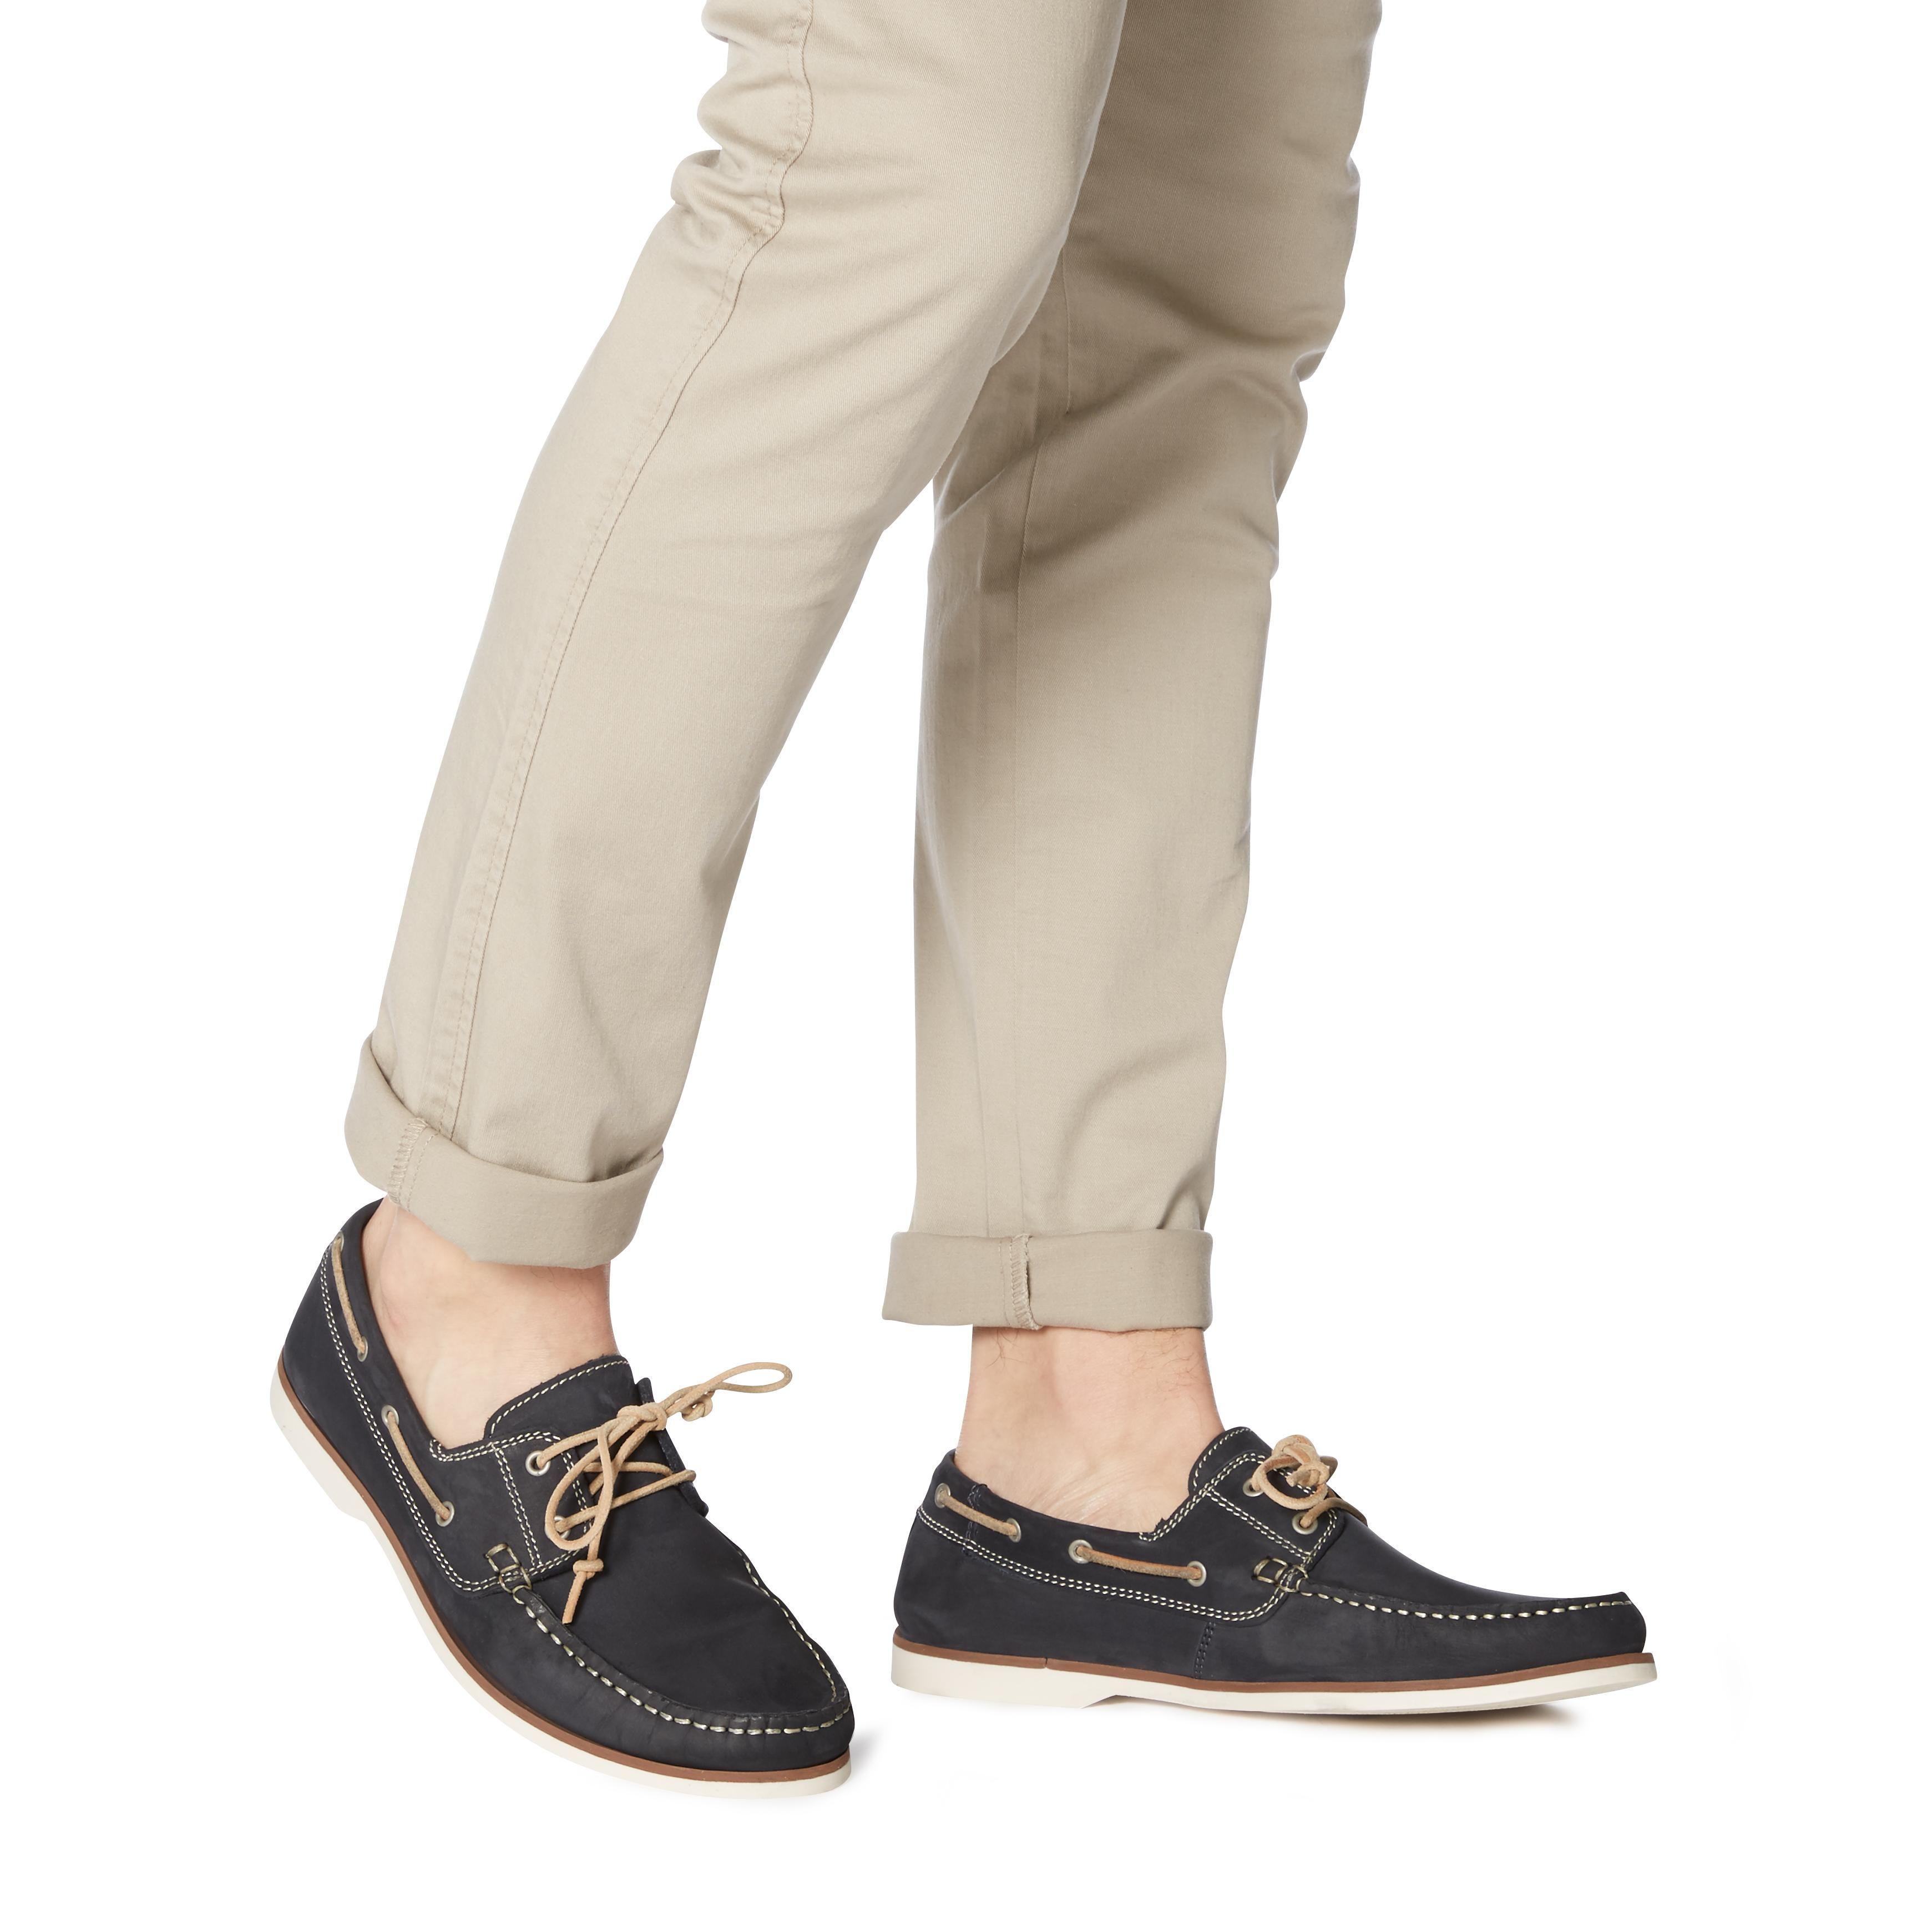 Bertie Mens BATTLESHIP Lace Up Boat Shoes